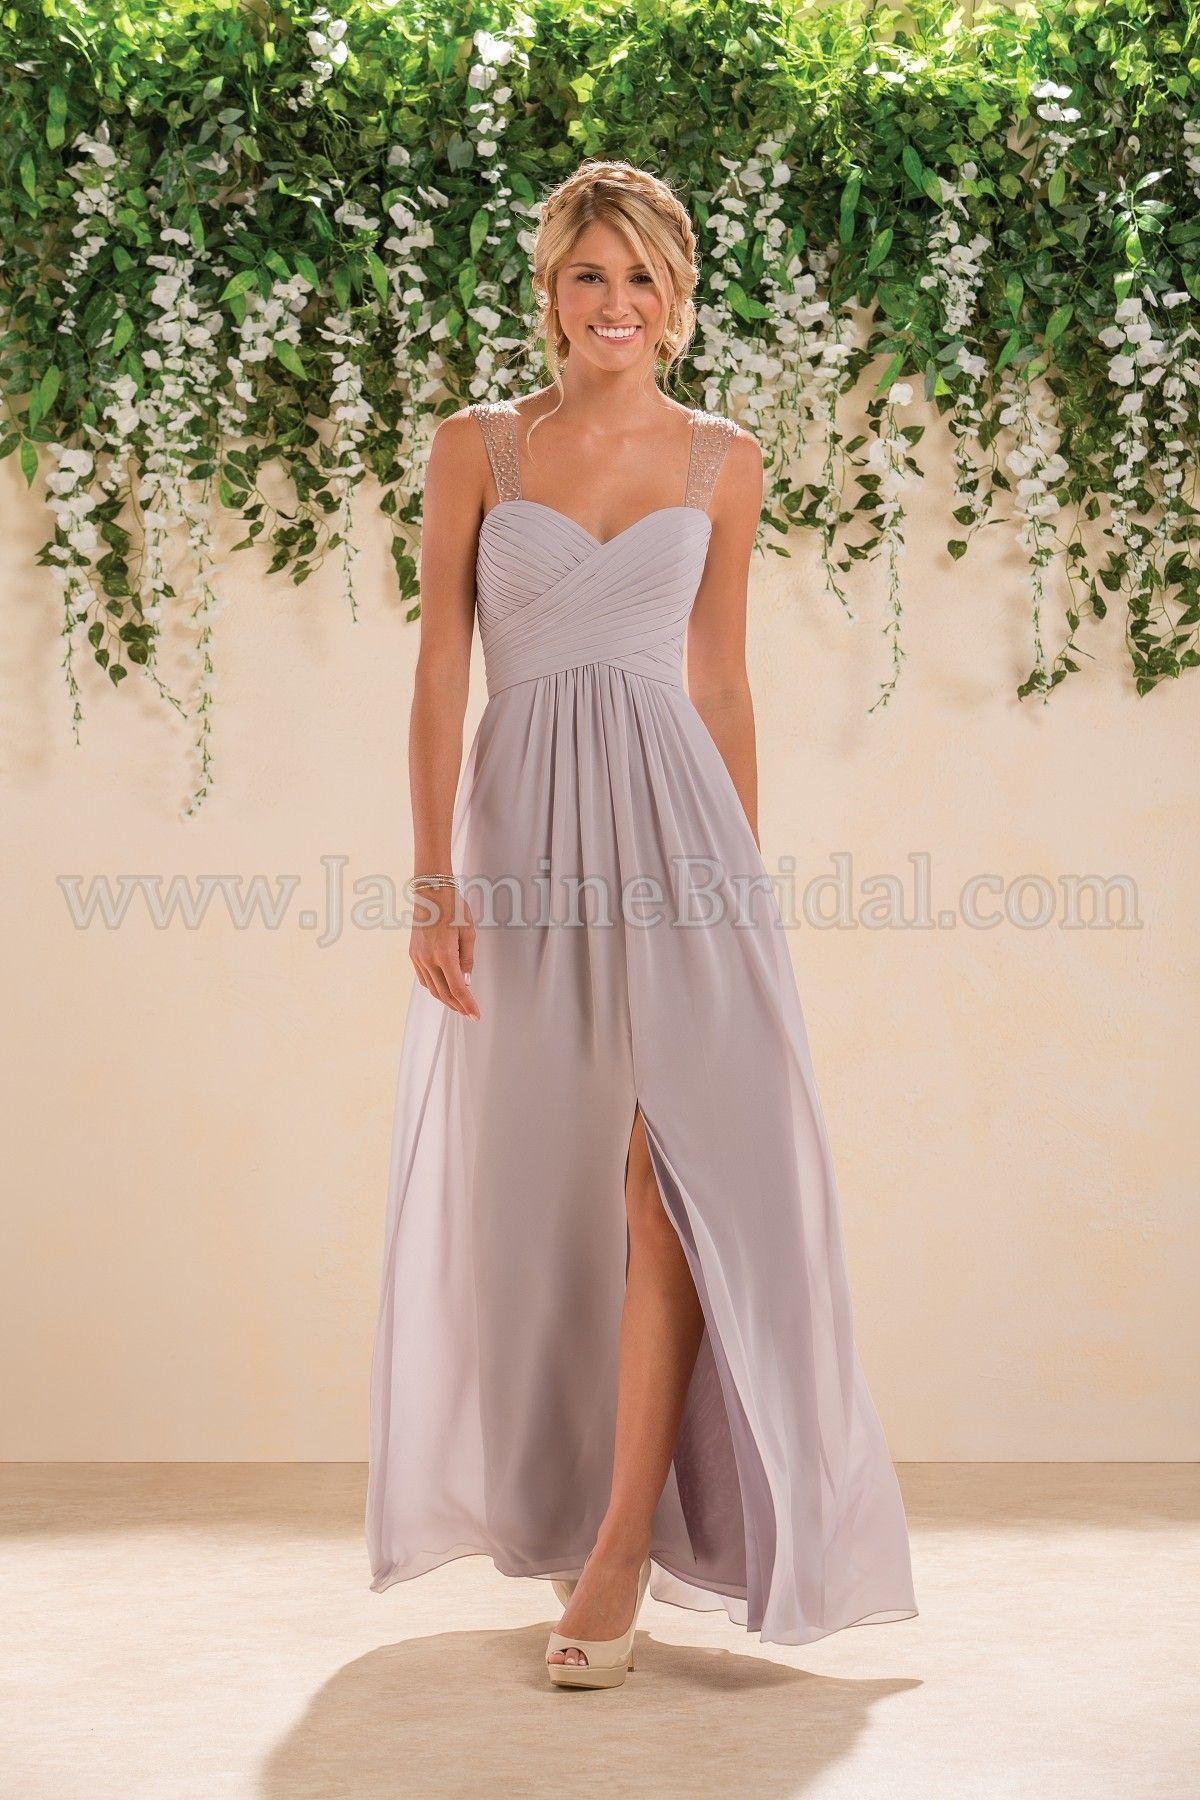 Jasmine Bridal Bridesmaid Dress B2 Style B183007 In Graphite Light Purple